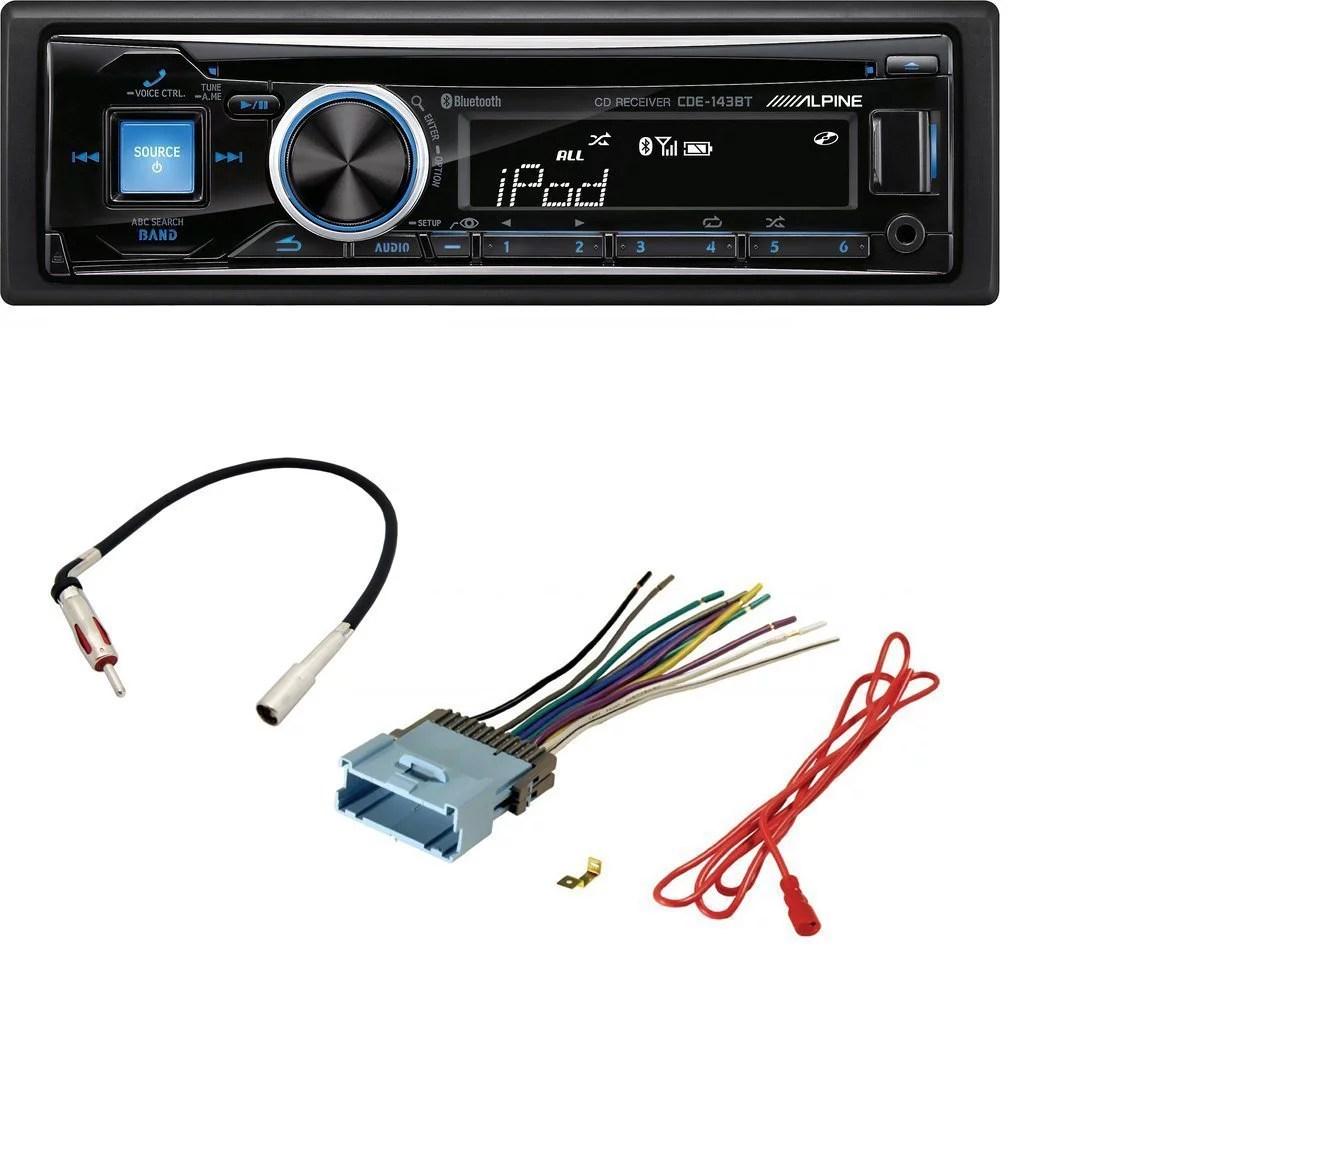 medium resolution of alpine cde 143bt cd usb mp3 wma aux ipod iphone equalizer eq bluetooth radio with stereo